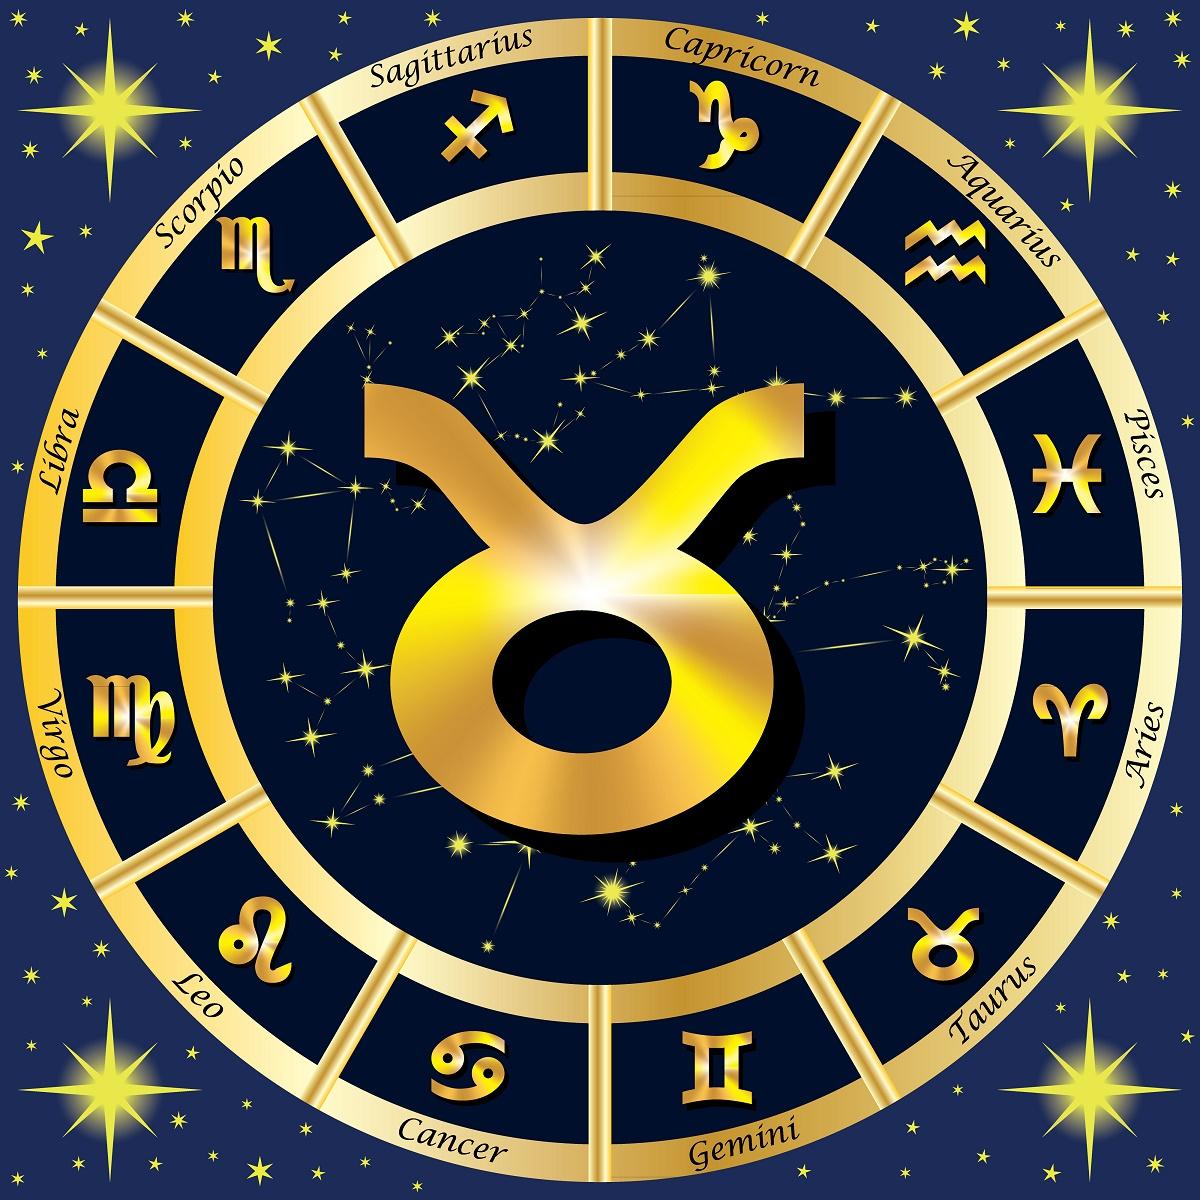 Horoscop săptămânal 23-29 octombrie 2017 Taur - Oana Hanganu